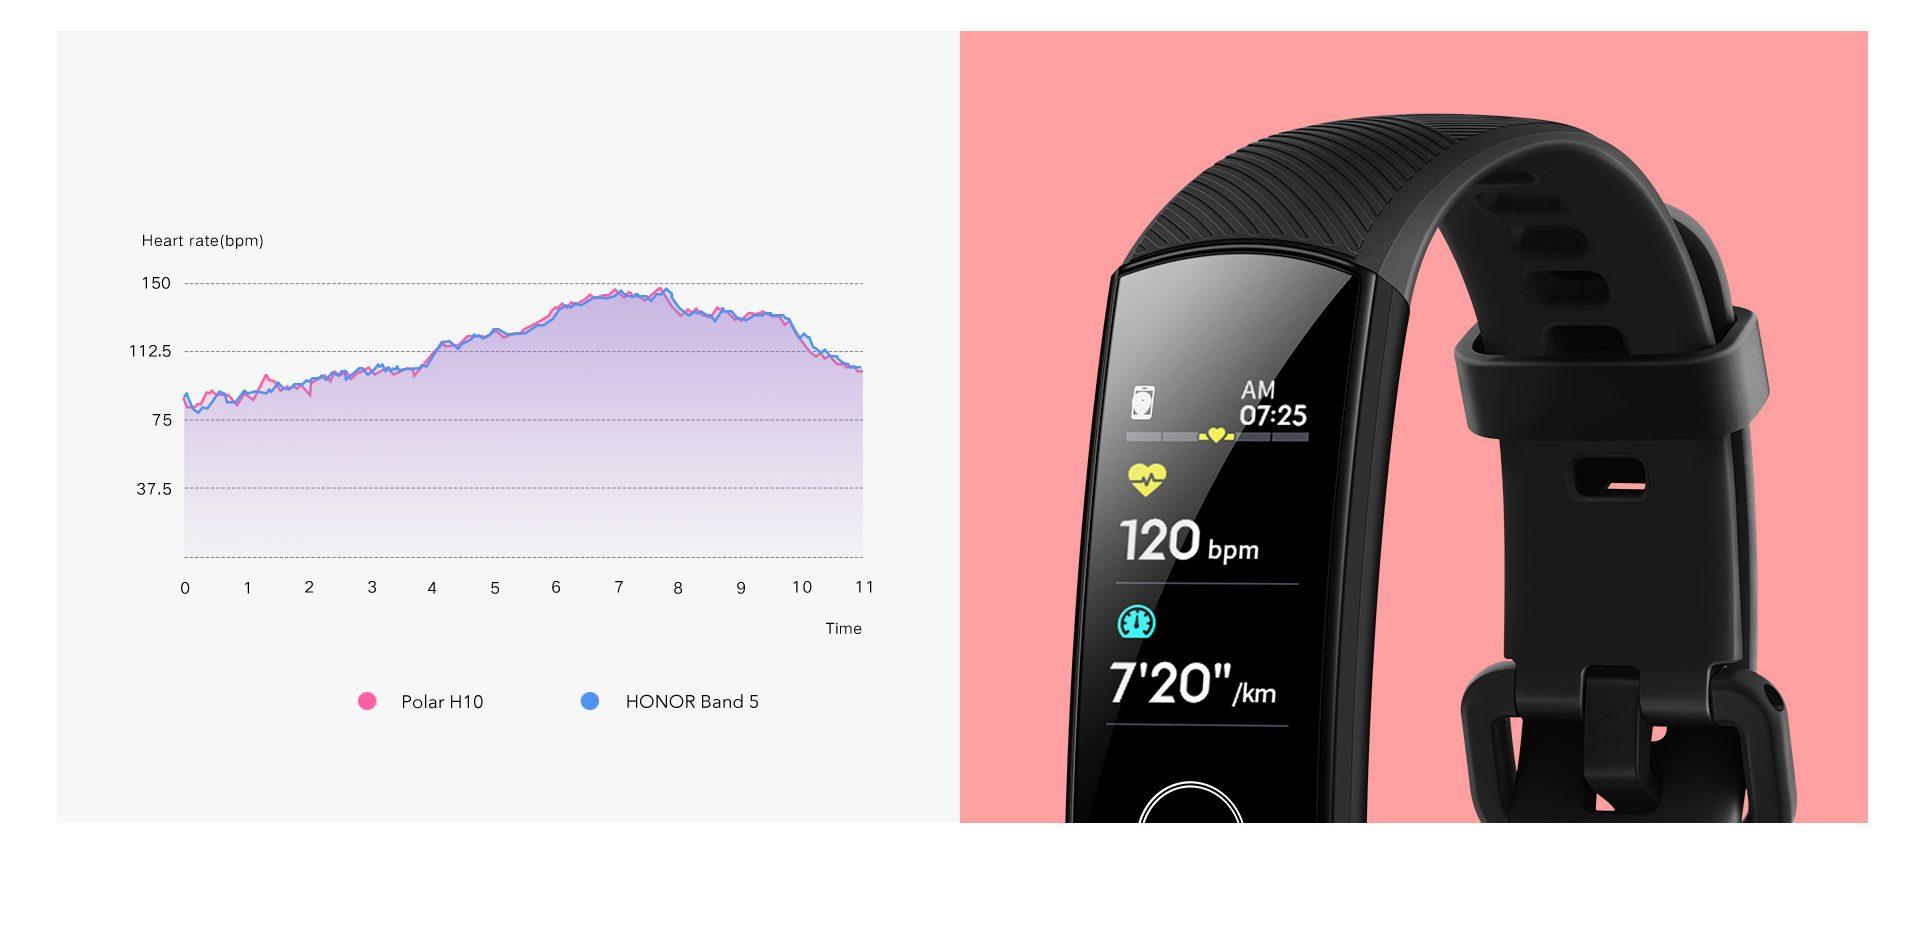 Honor Band 5 Heart rate monitoring